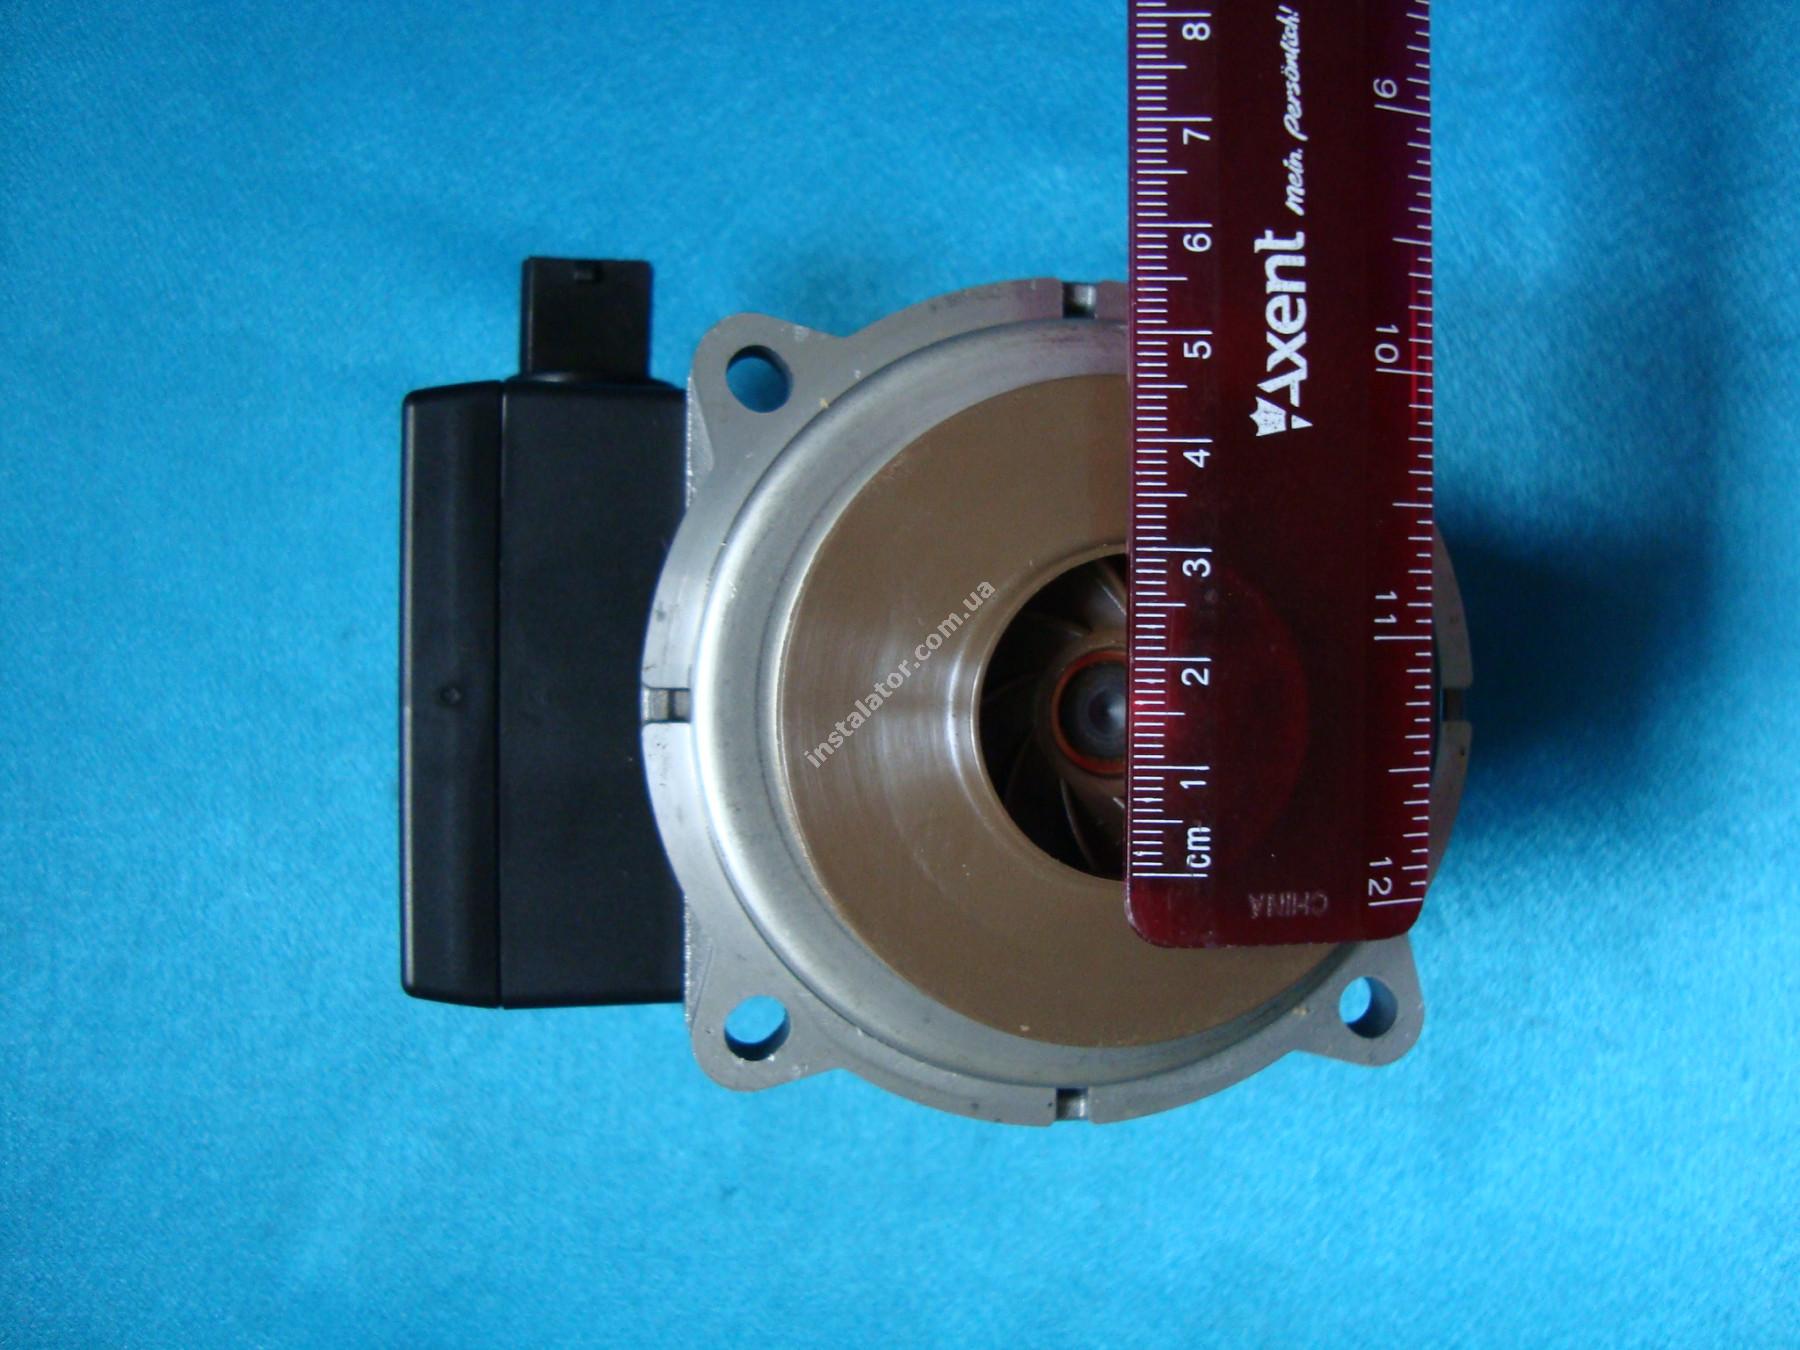 5192600 Циркуляційний насос SIME Dab VA 55 Format.Zip 25 OF - BF/Metropolis full-image-1